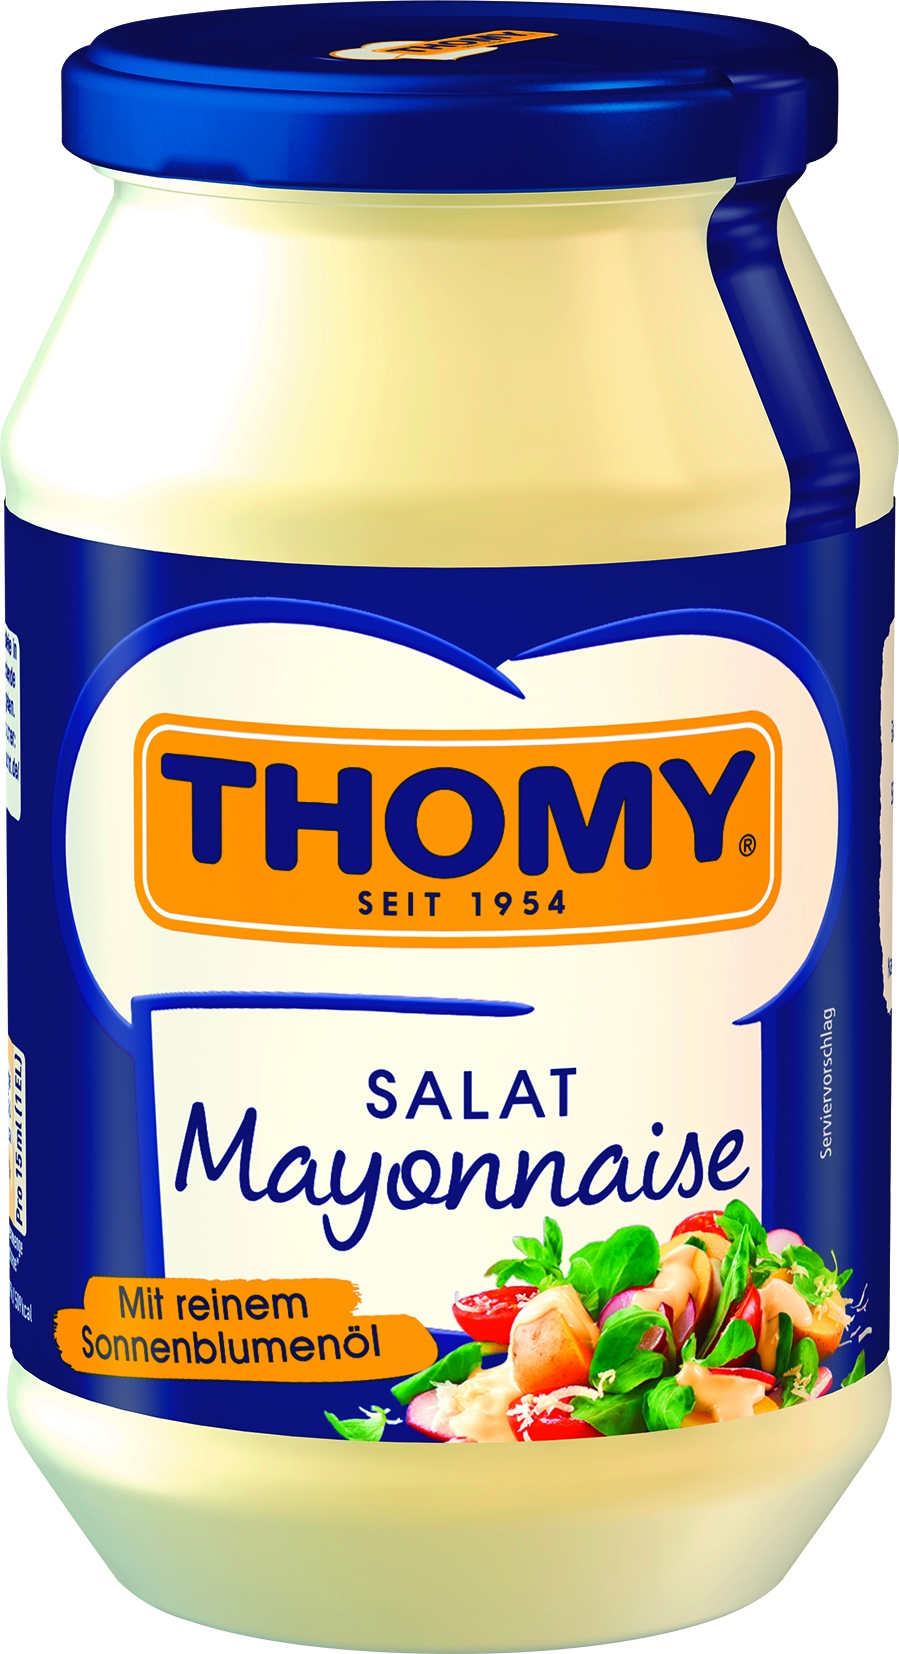 Salatmayonaise